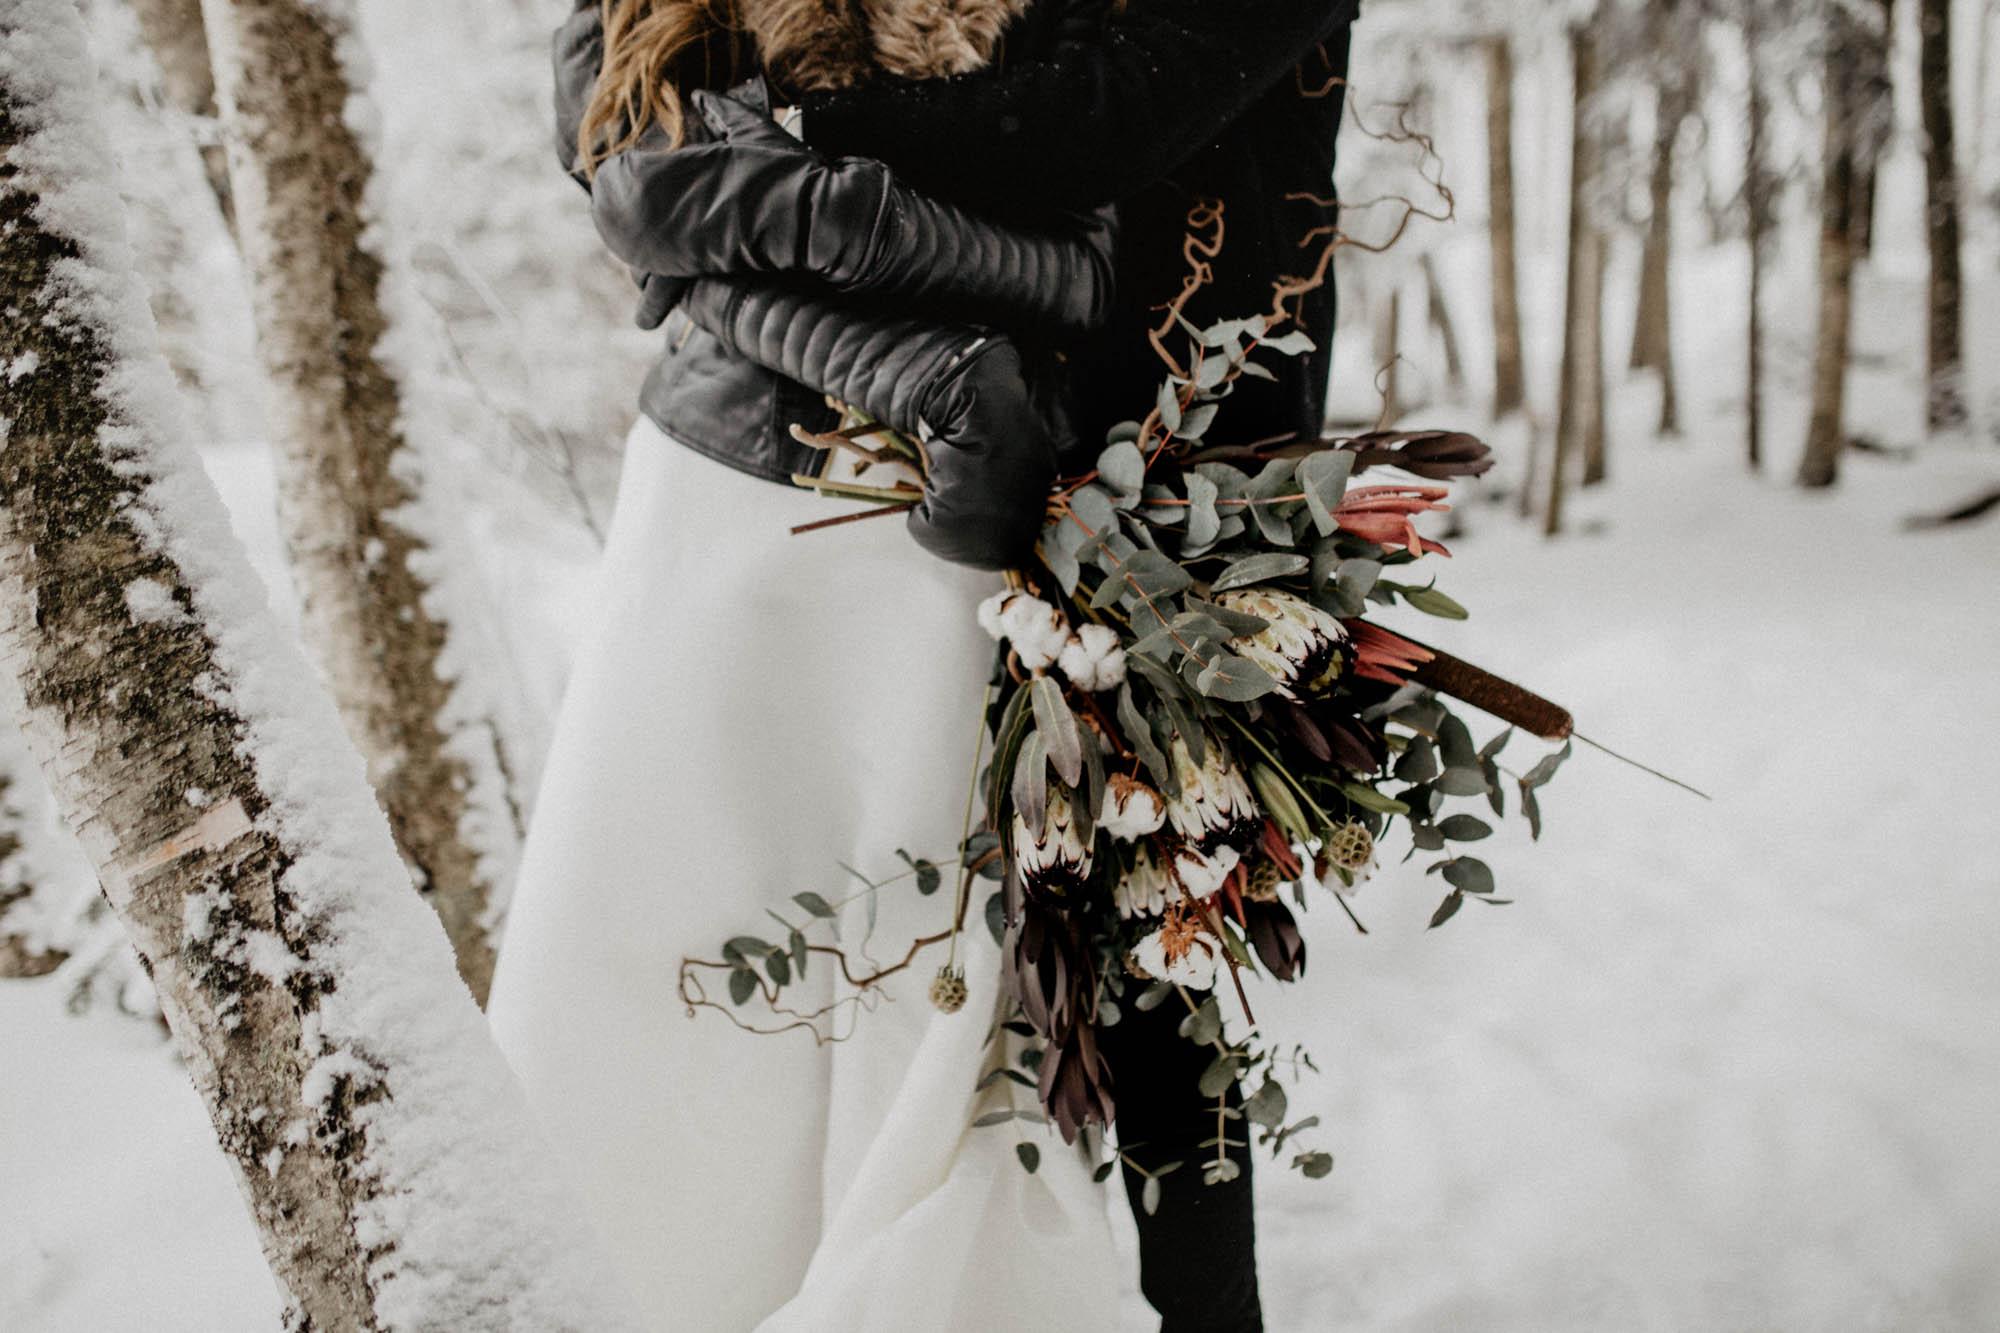 ashley_schulman_photography-winter_wedding_tampere-22.jpg